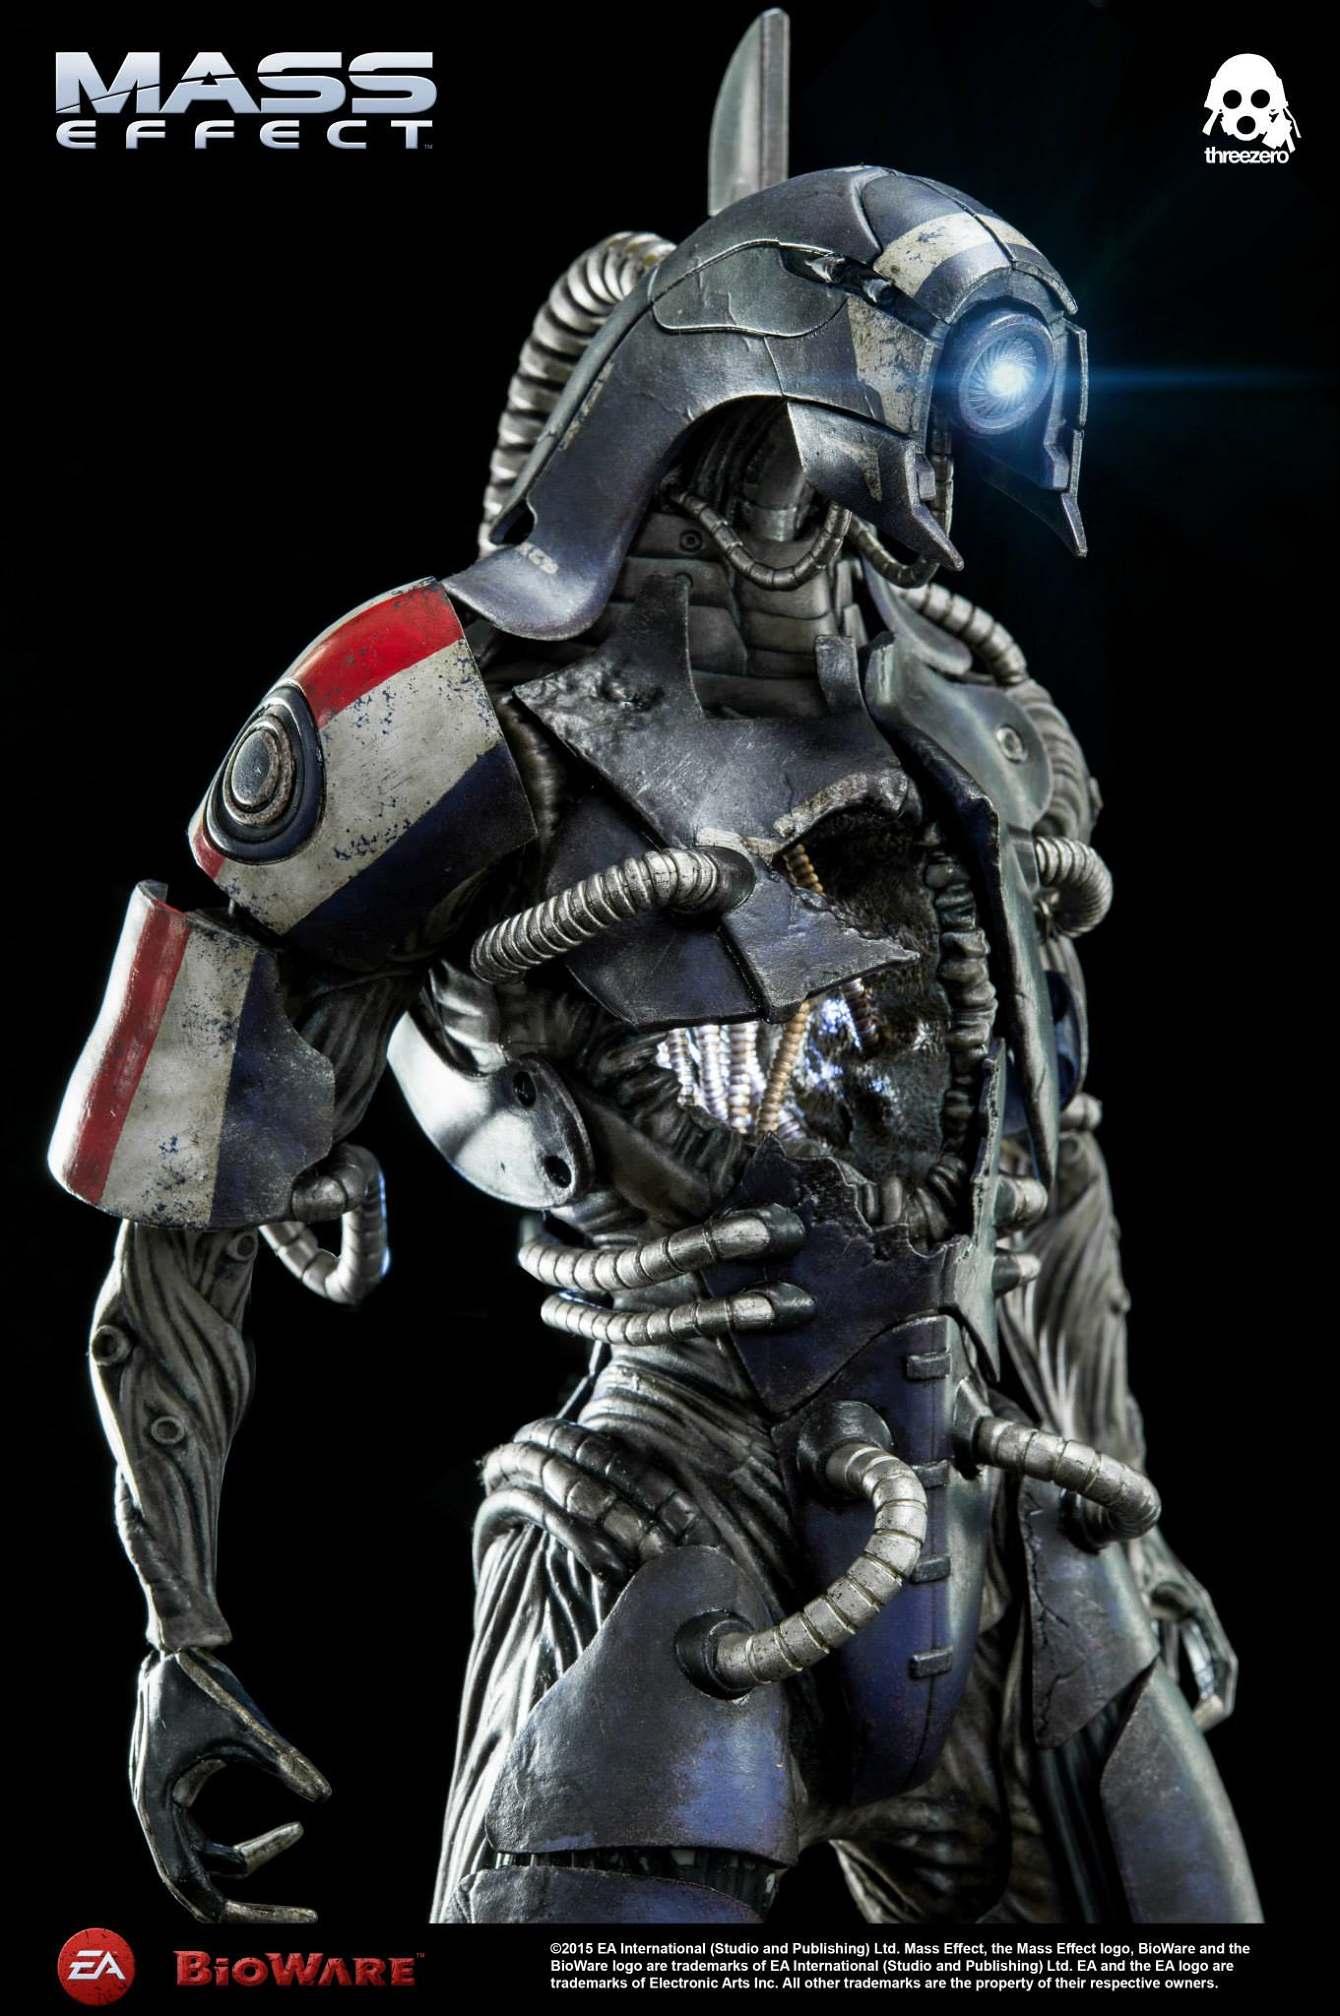 ThreeZero-Bioware-video-game-Legion-Mass-Effect-figure-9_1340_c.jpg